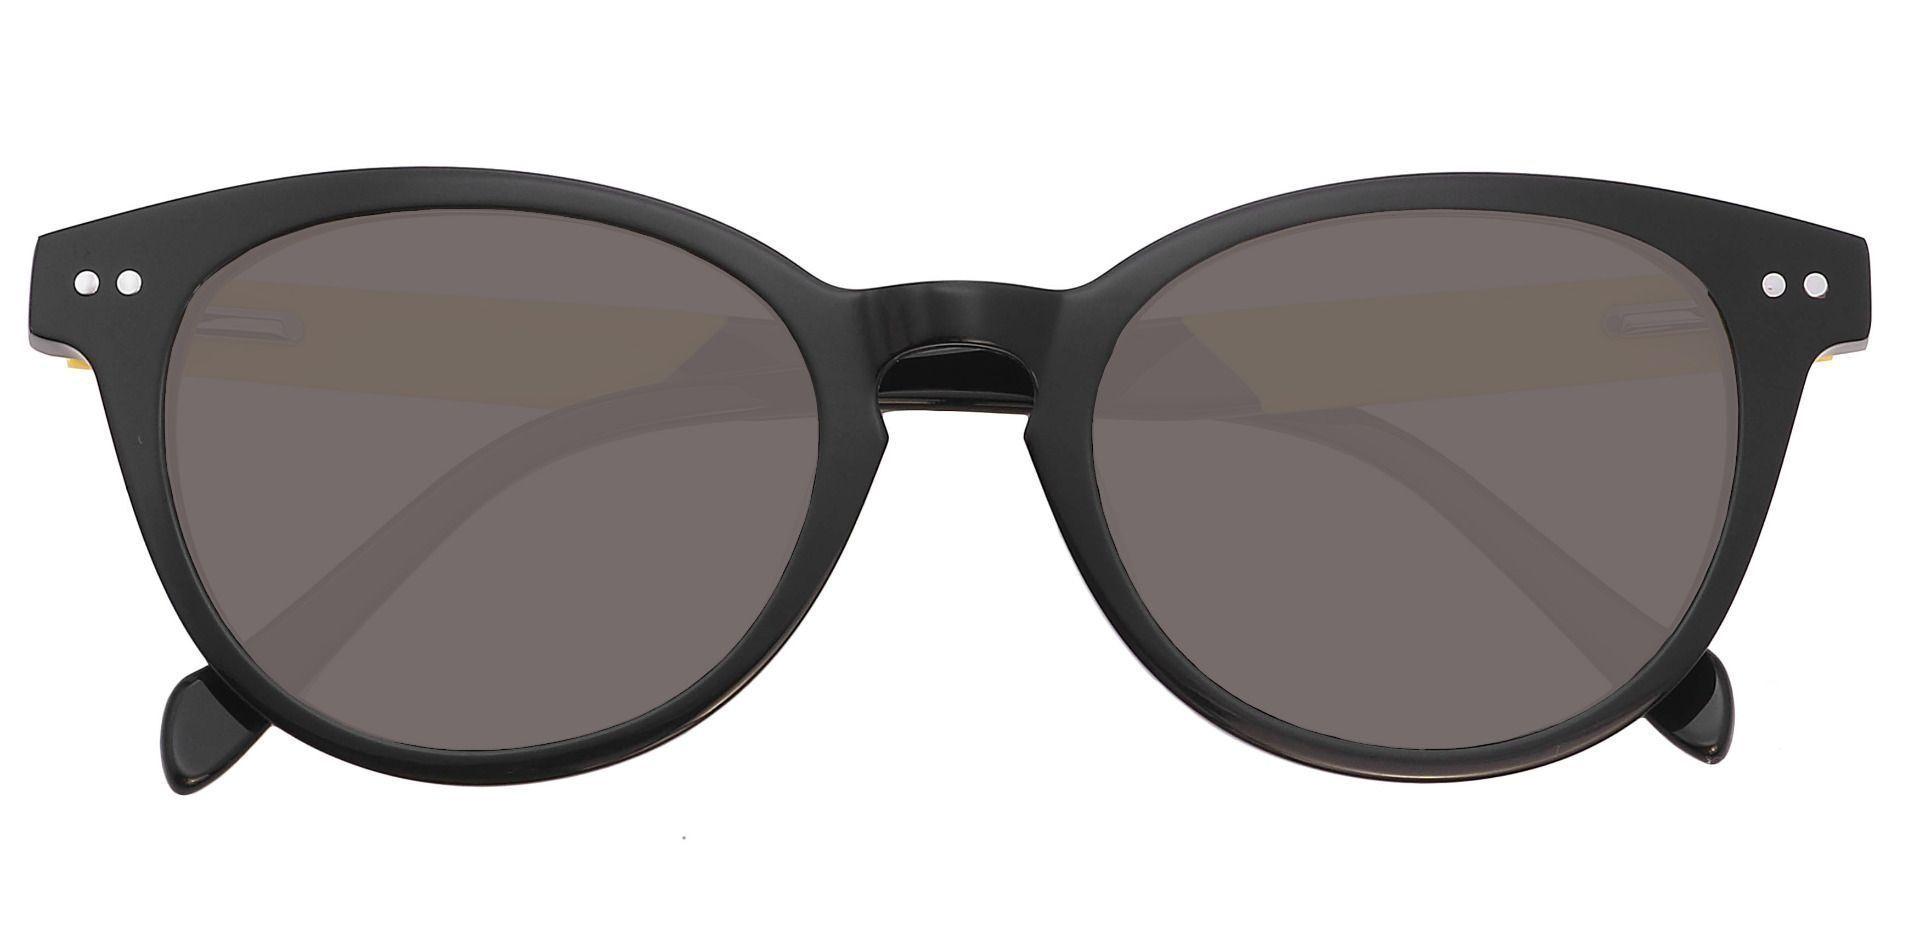 Forbes Oval Prescription Sunglasses - Black Frame With Gray Lenses